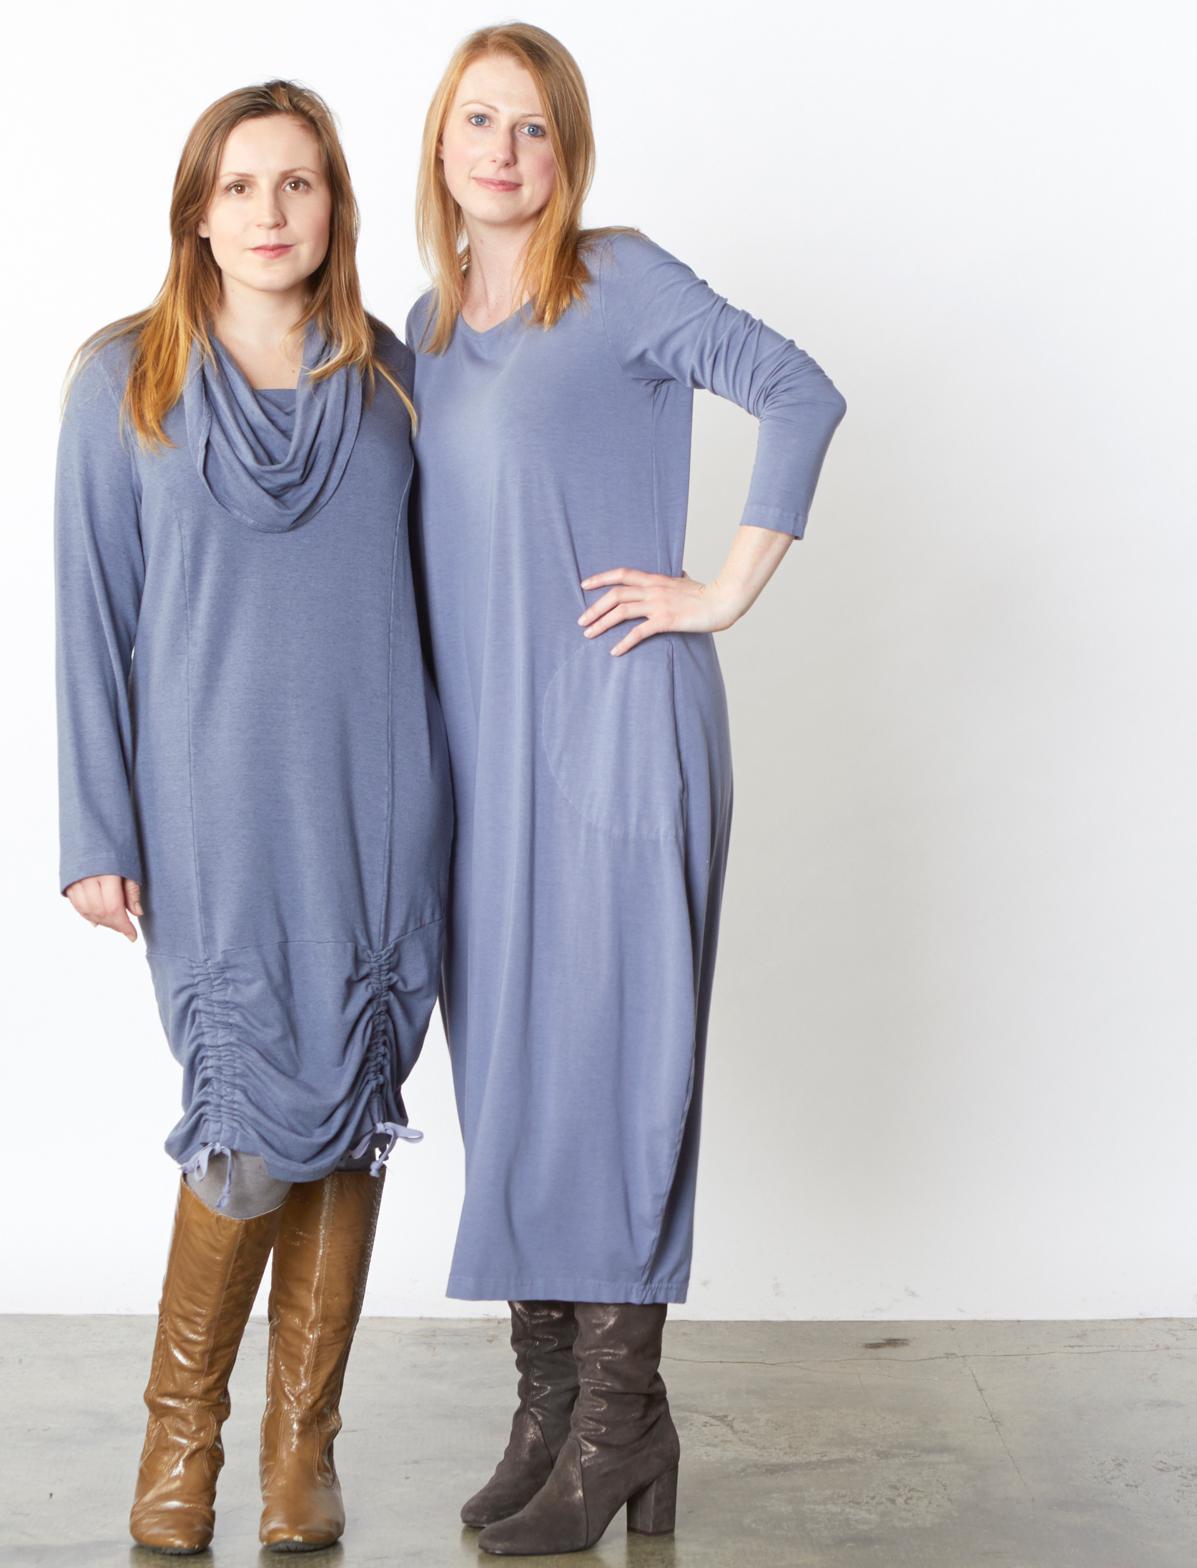 Annika Dress in Fontana Grey French Terry, Philippa Dress in Fontana Organic Bamboo Cotton